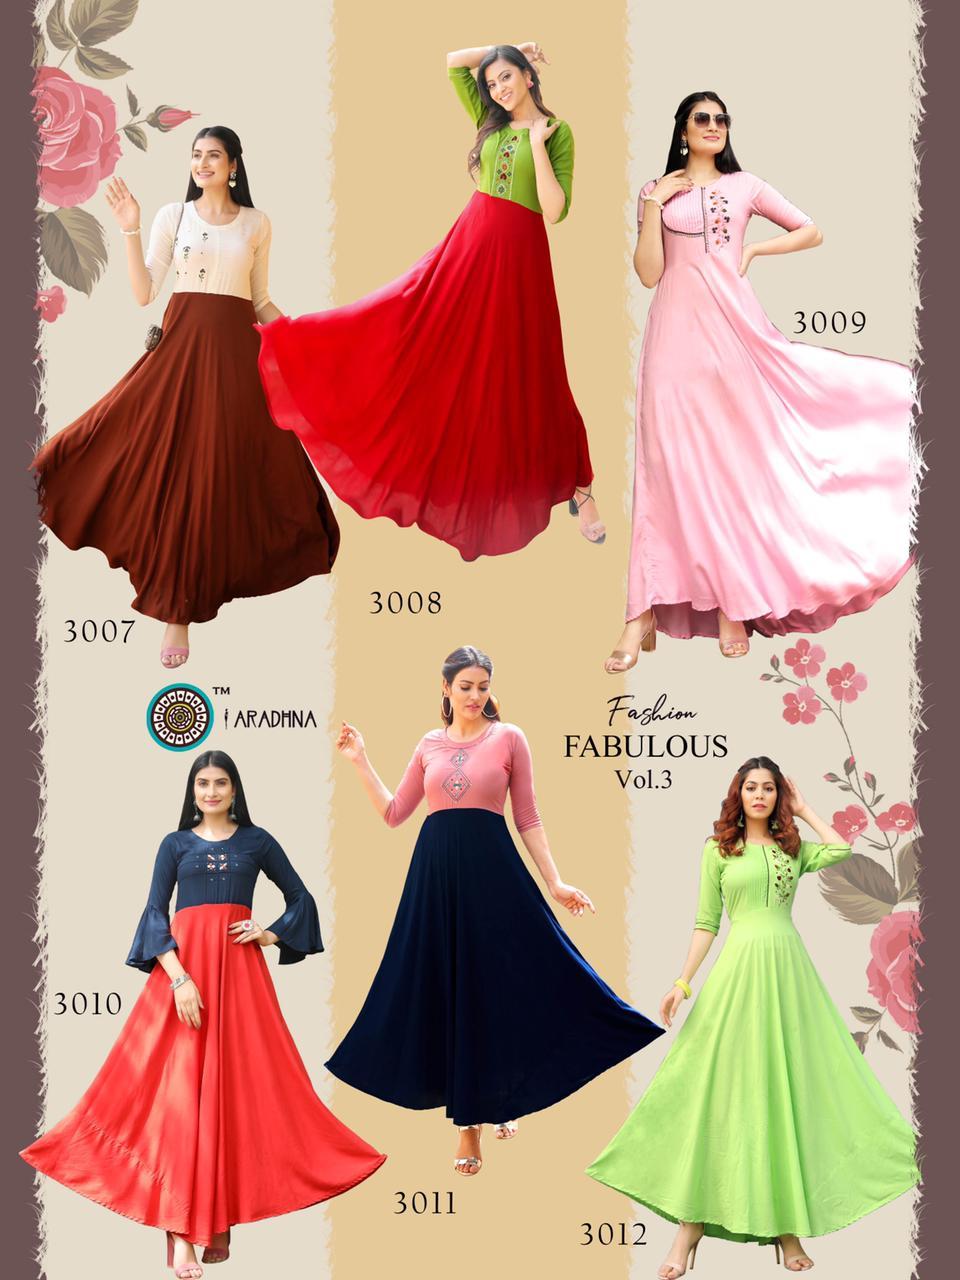 Aradhna Fashion Fabulous Vol 3 Kurti Wholesale Catalog 12 Pcs 21 - Aradhna Fashion Fabulous Vol 3 Kurti Wholesale Catalog 12 Pcs